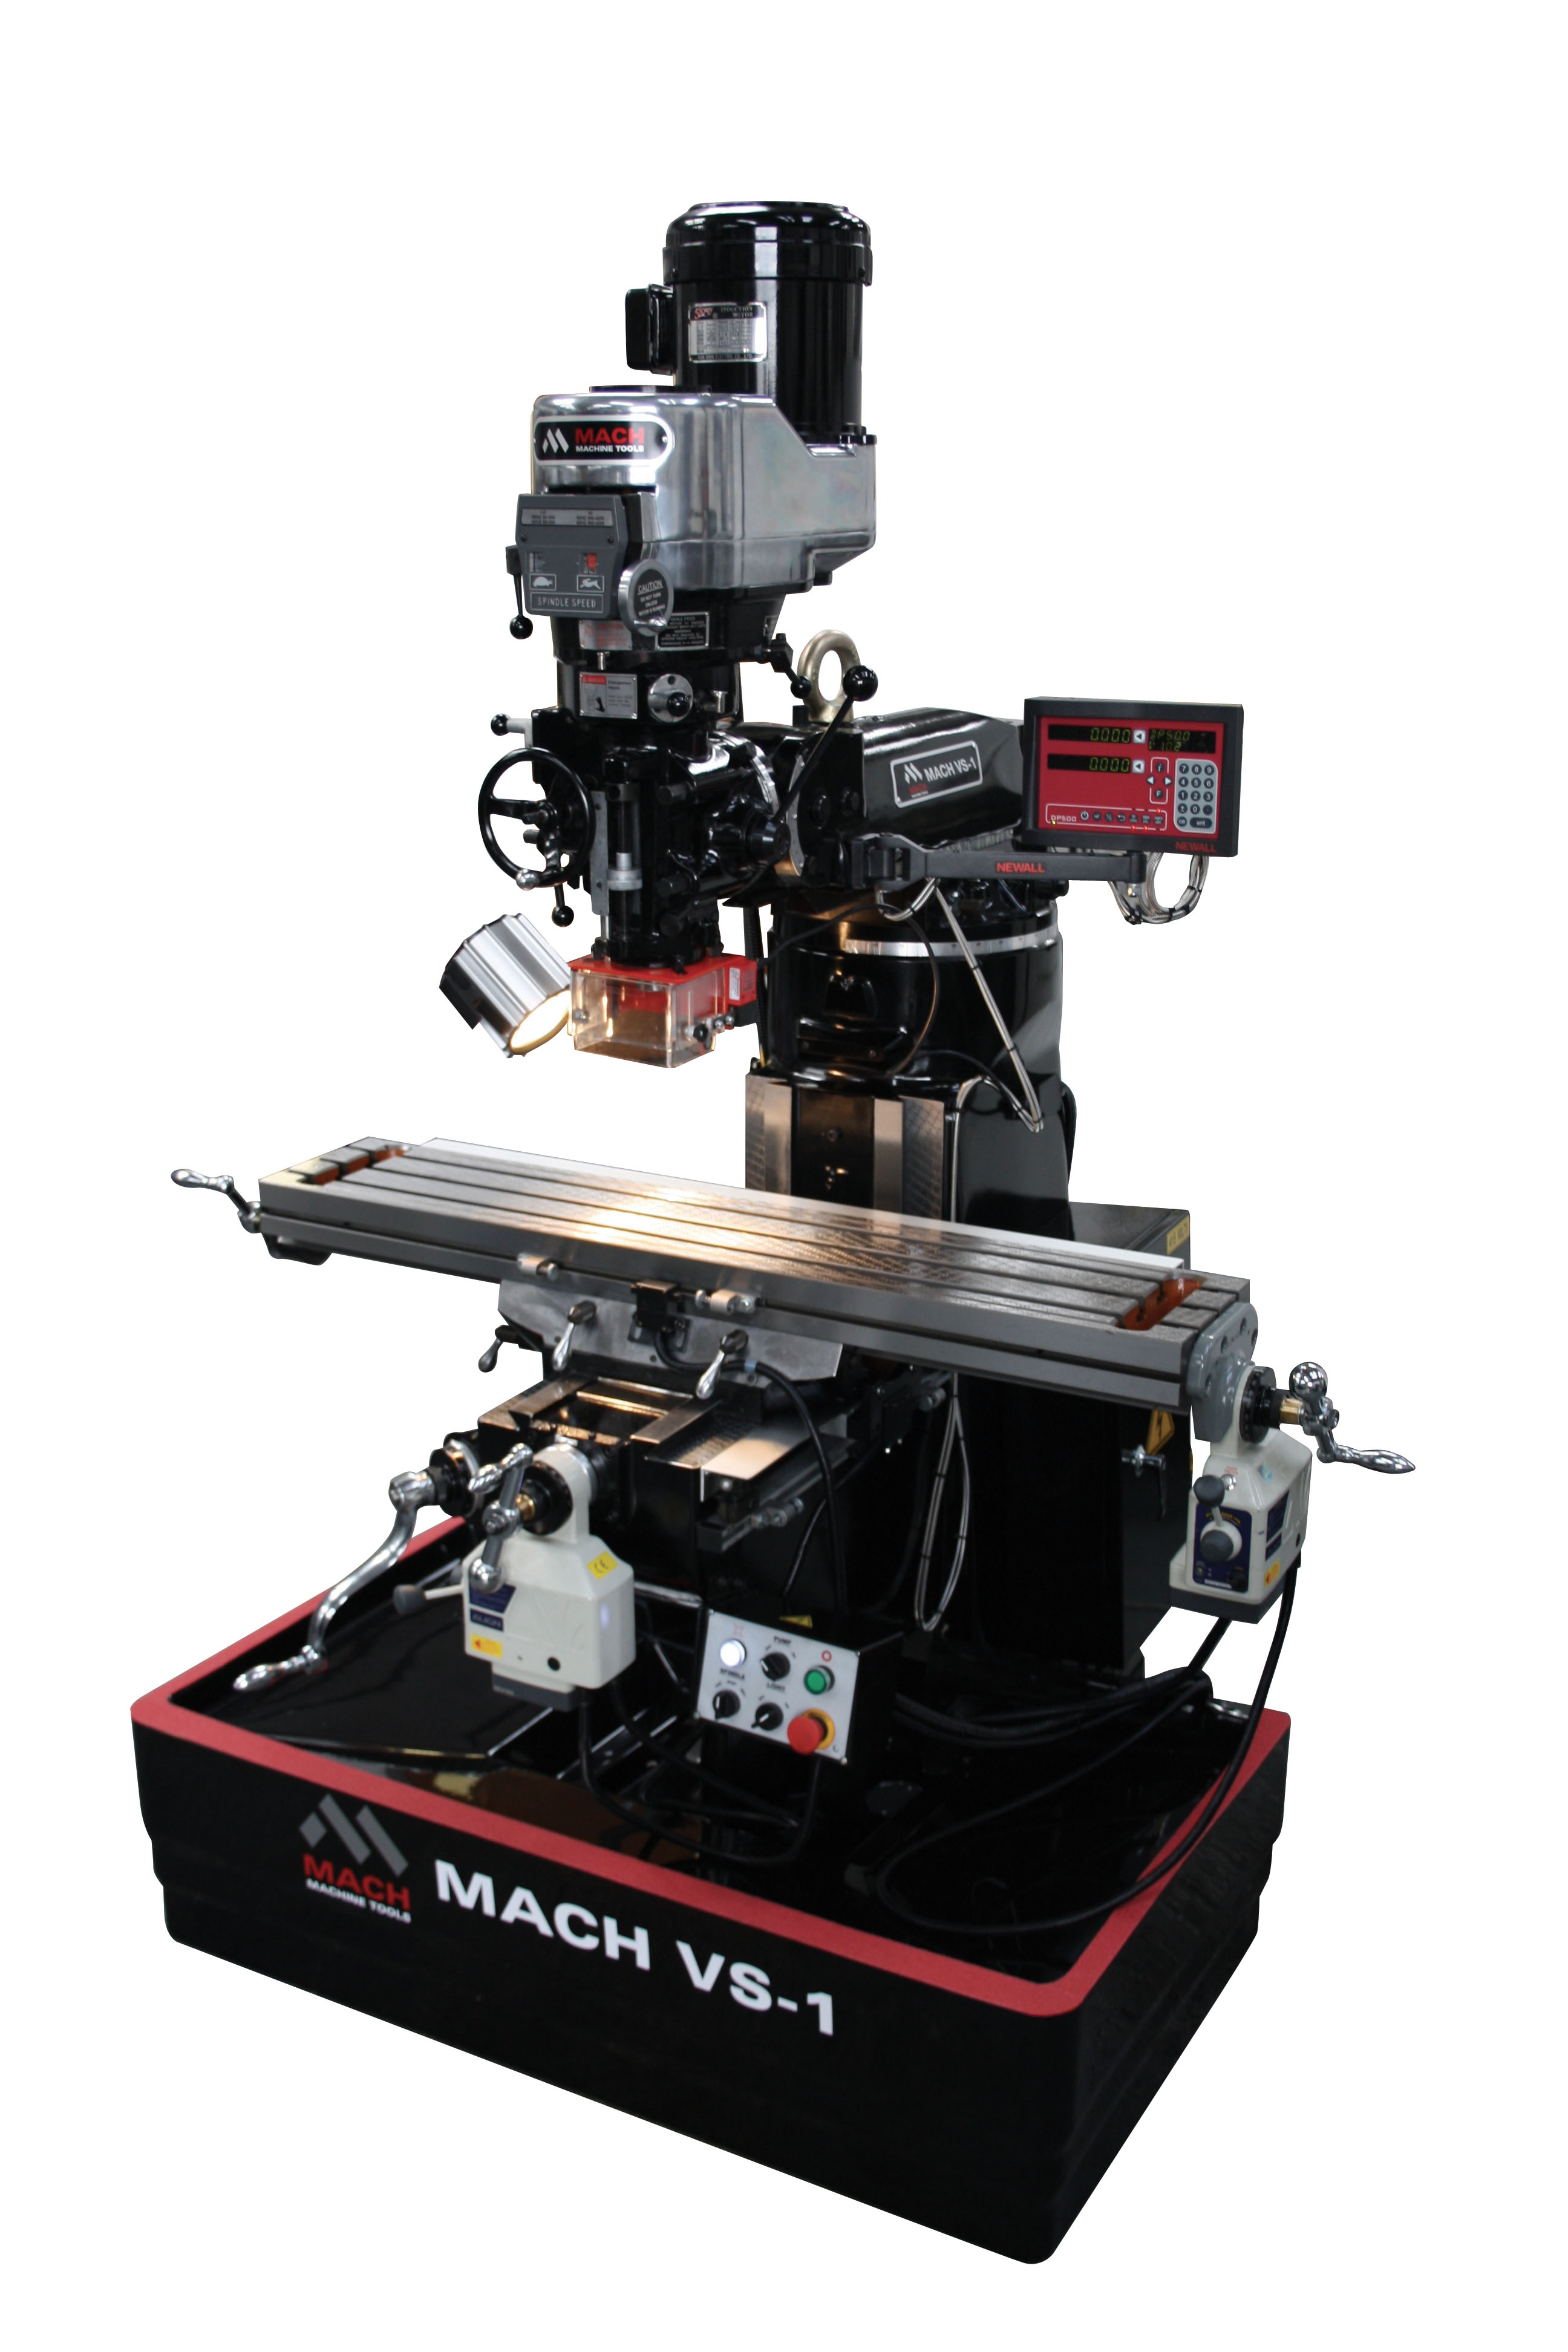 Vmc Milling Machine Manual 1999 Bmw R1150gs Instrument Fuse Box Diagram Rugged Construction Array Homepage Mach Tools Rh Machmt